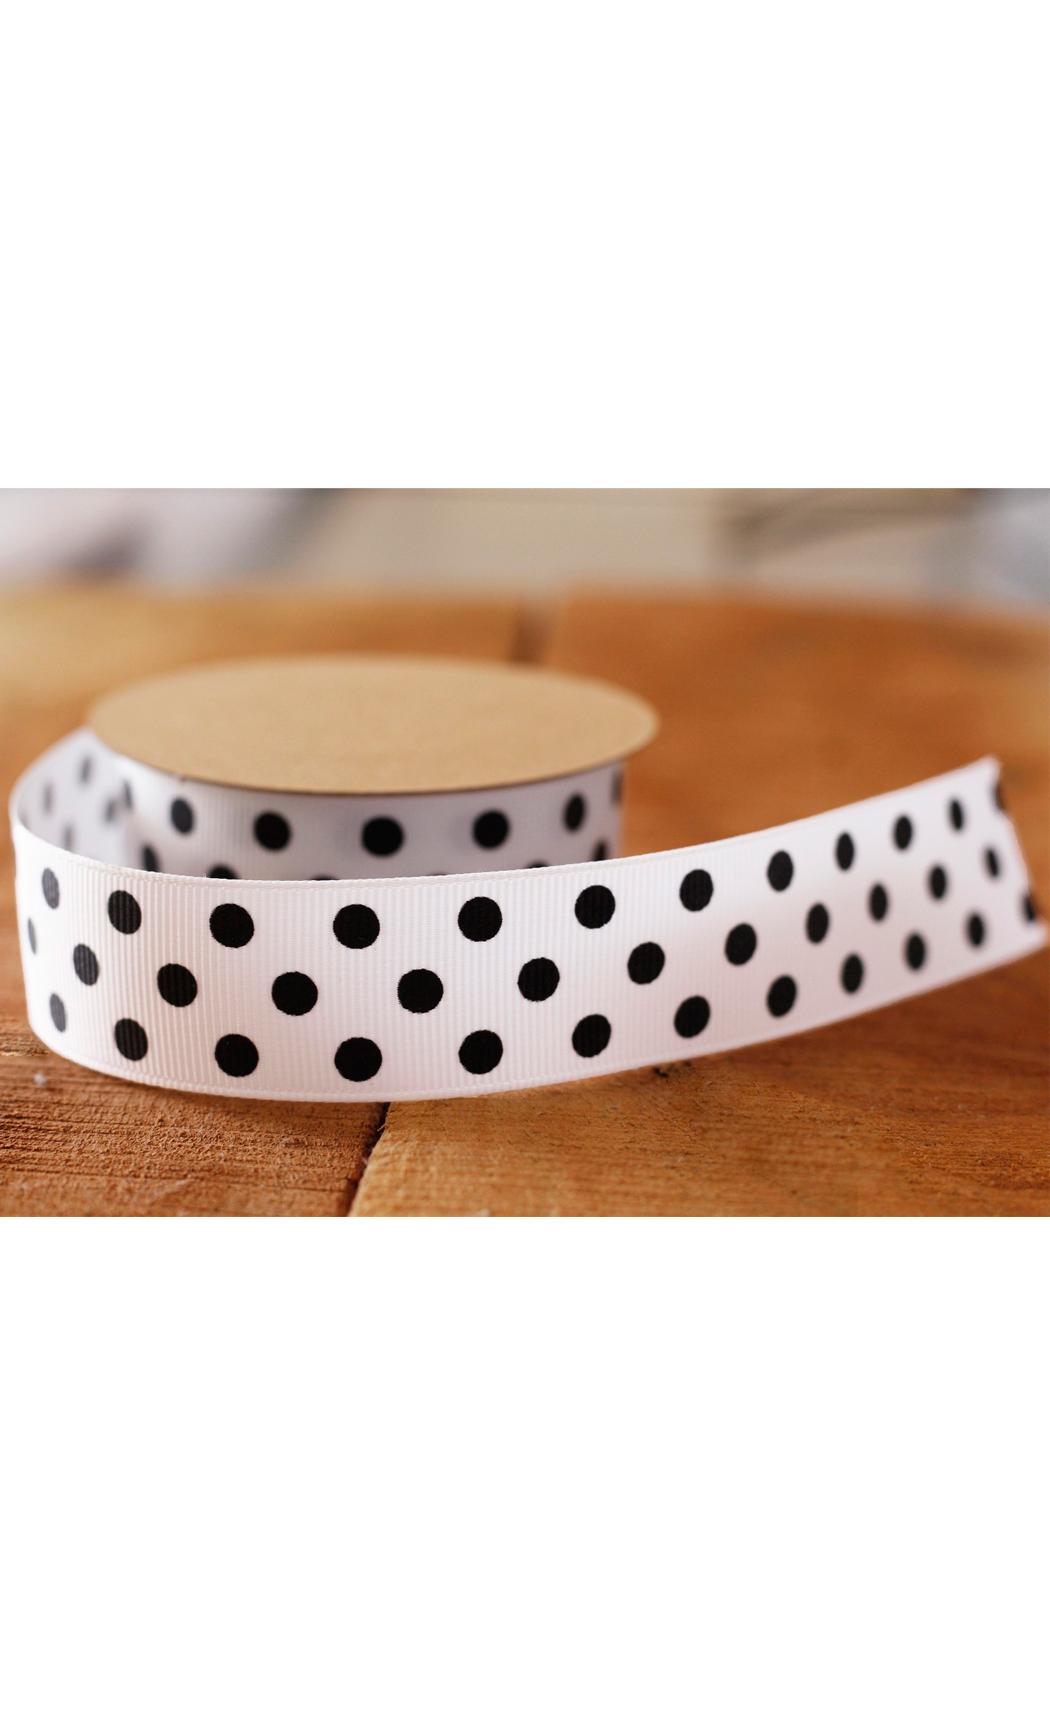 White Ribbon with Black Polka Dots - Buy Online